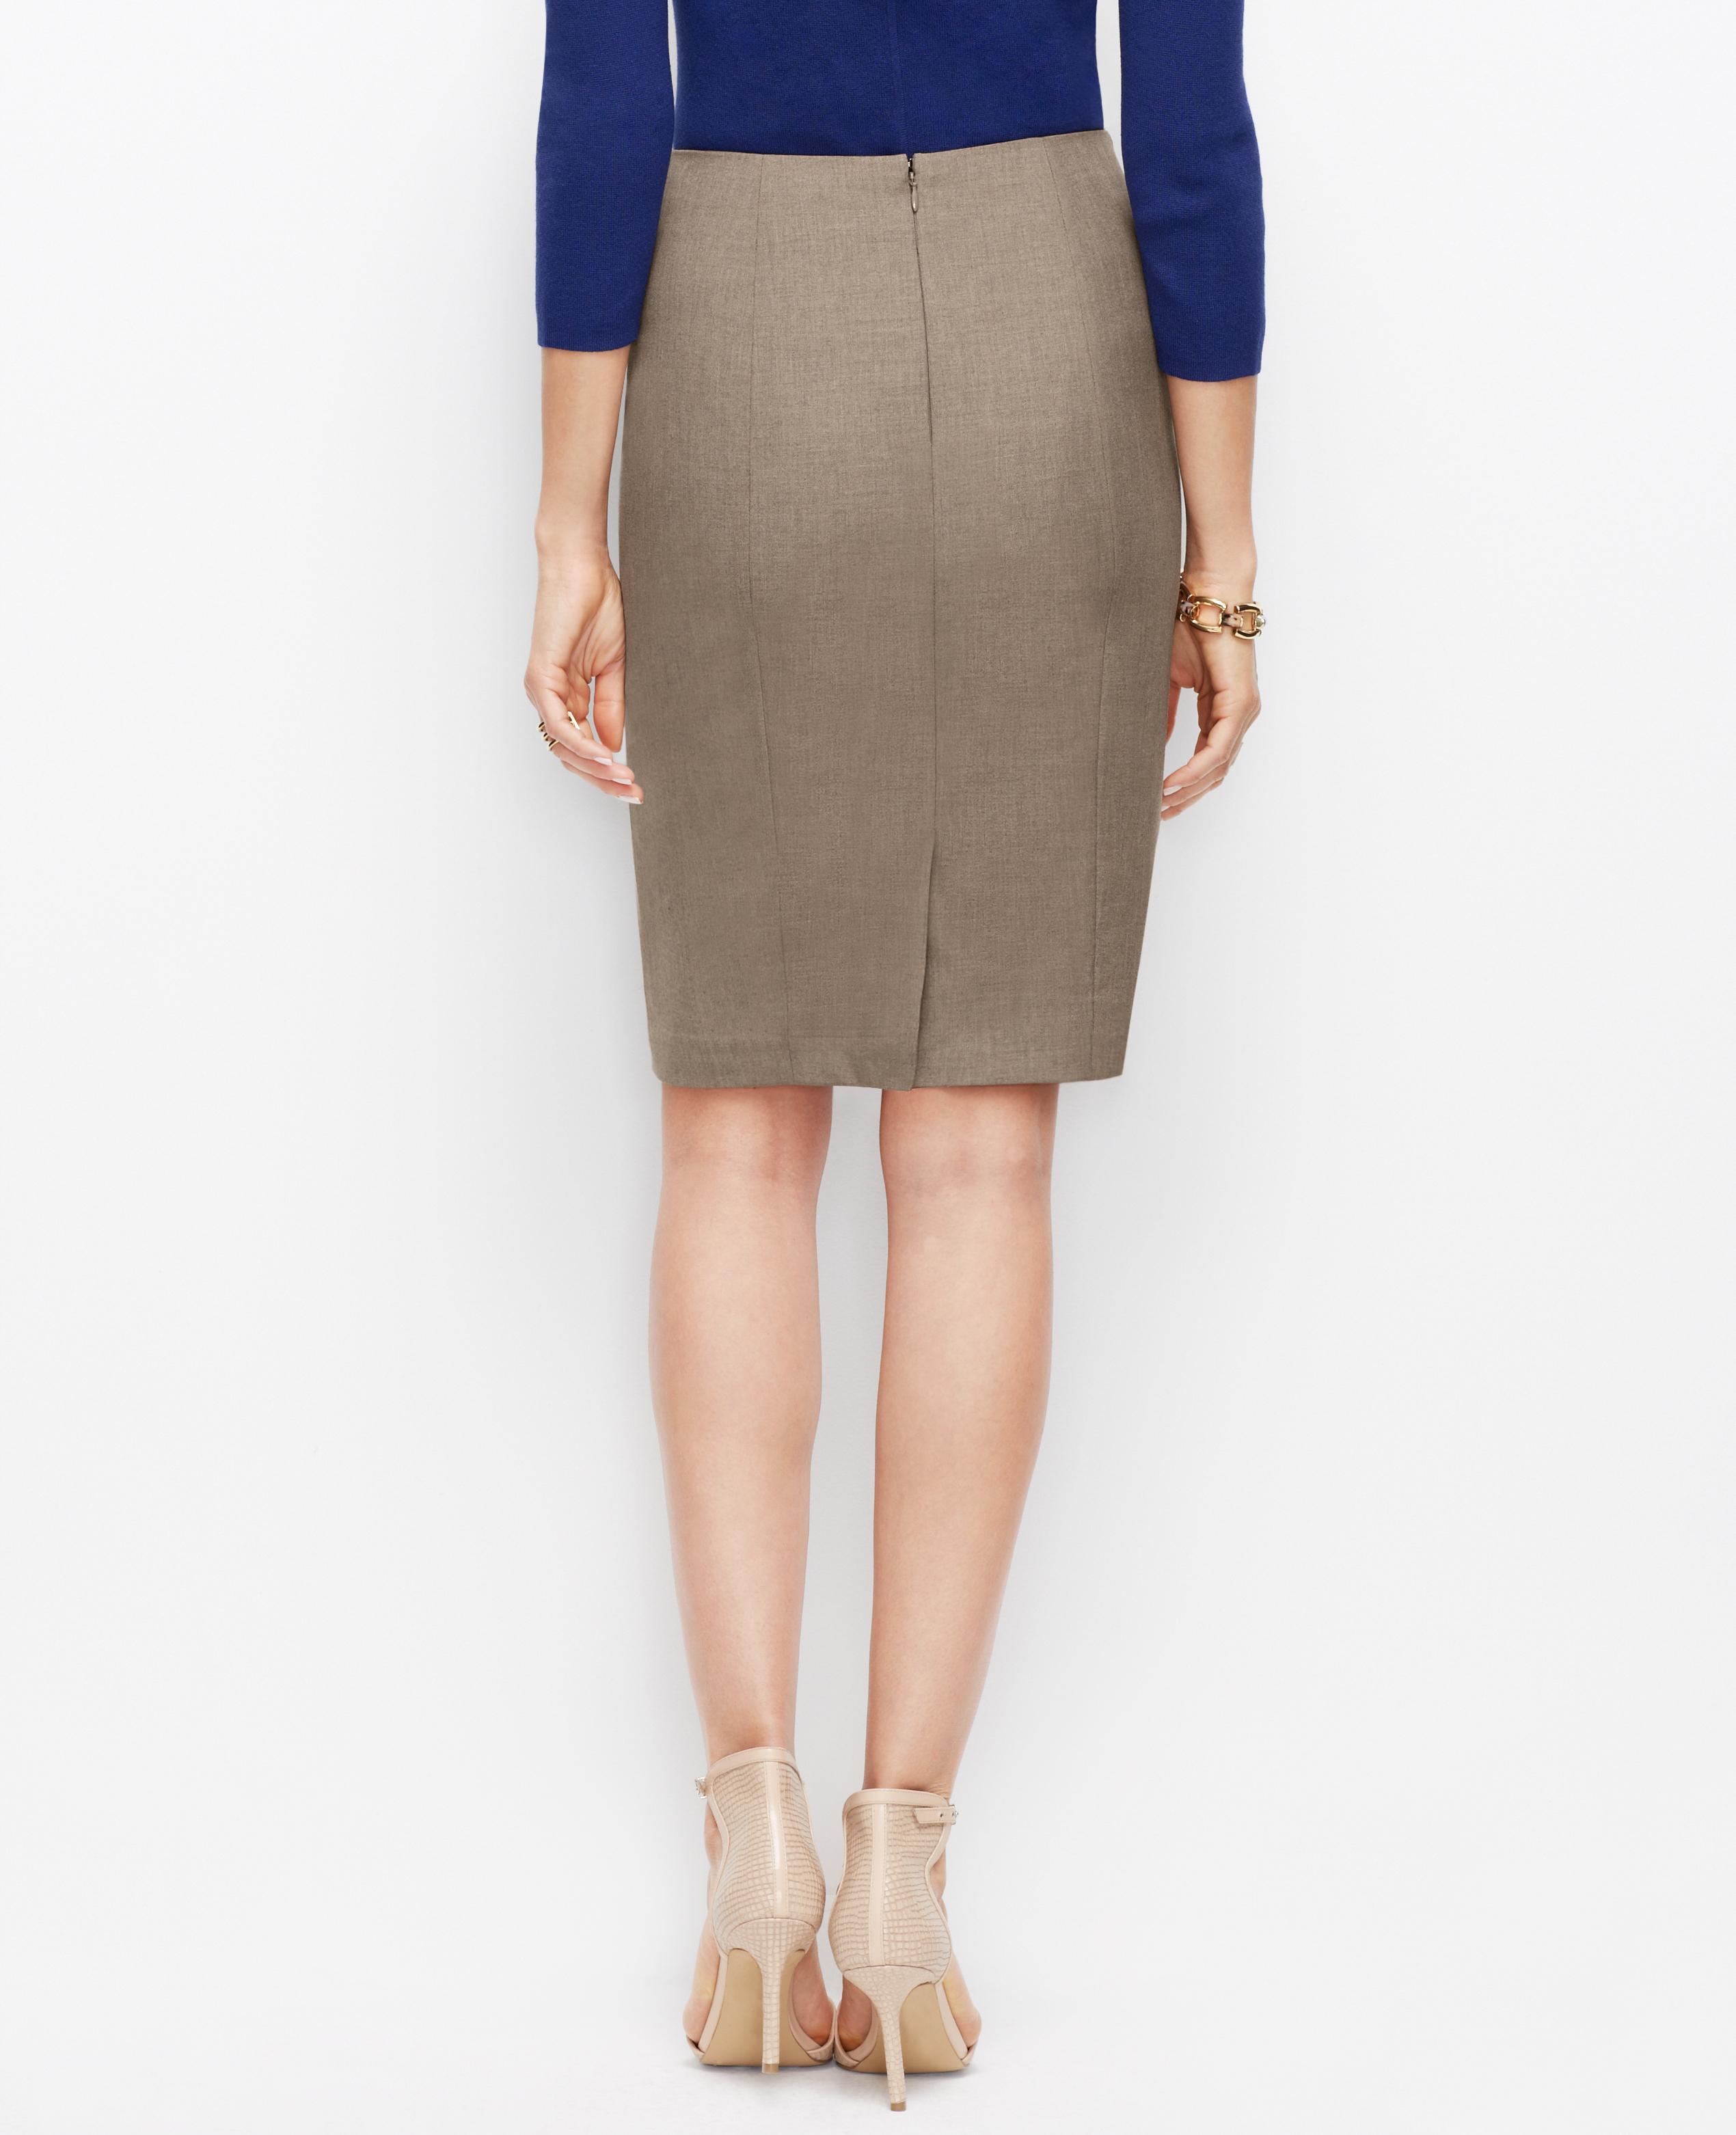 28e563b70 Ann Taylor Petite All-Season Stretch Pencil Skirt in Brown - Lyst